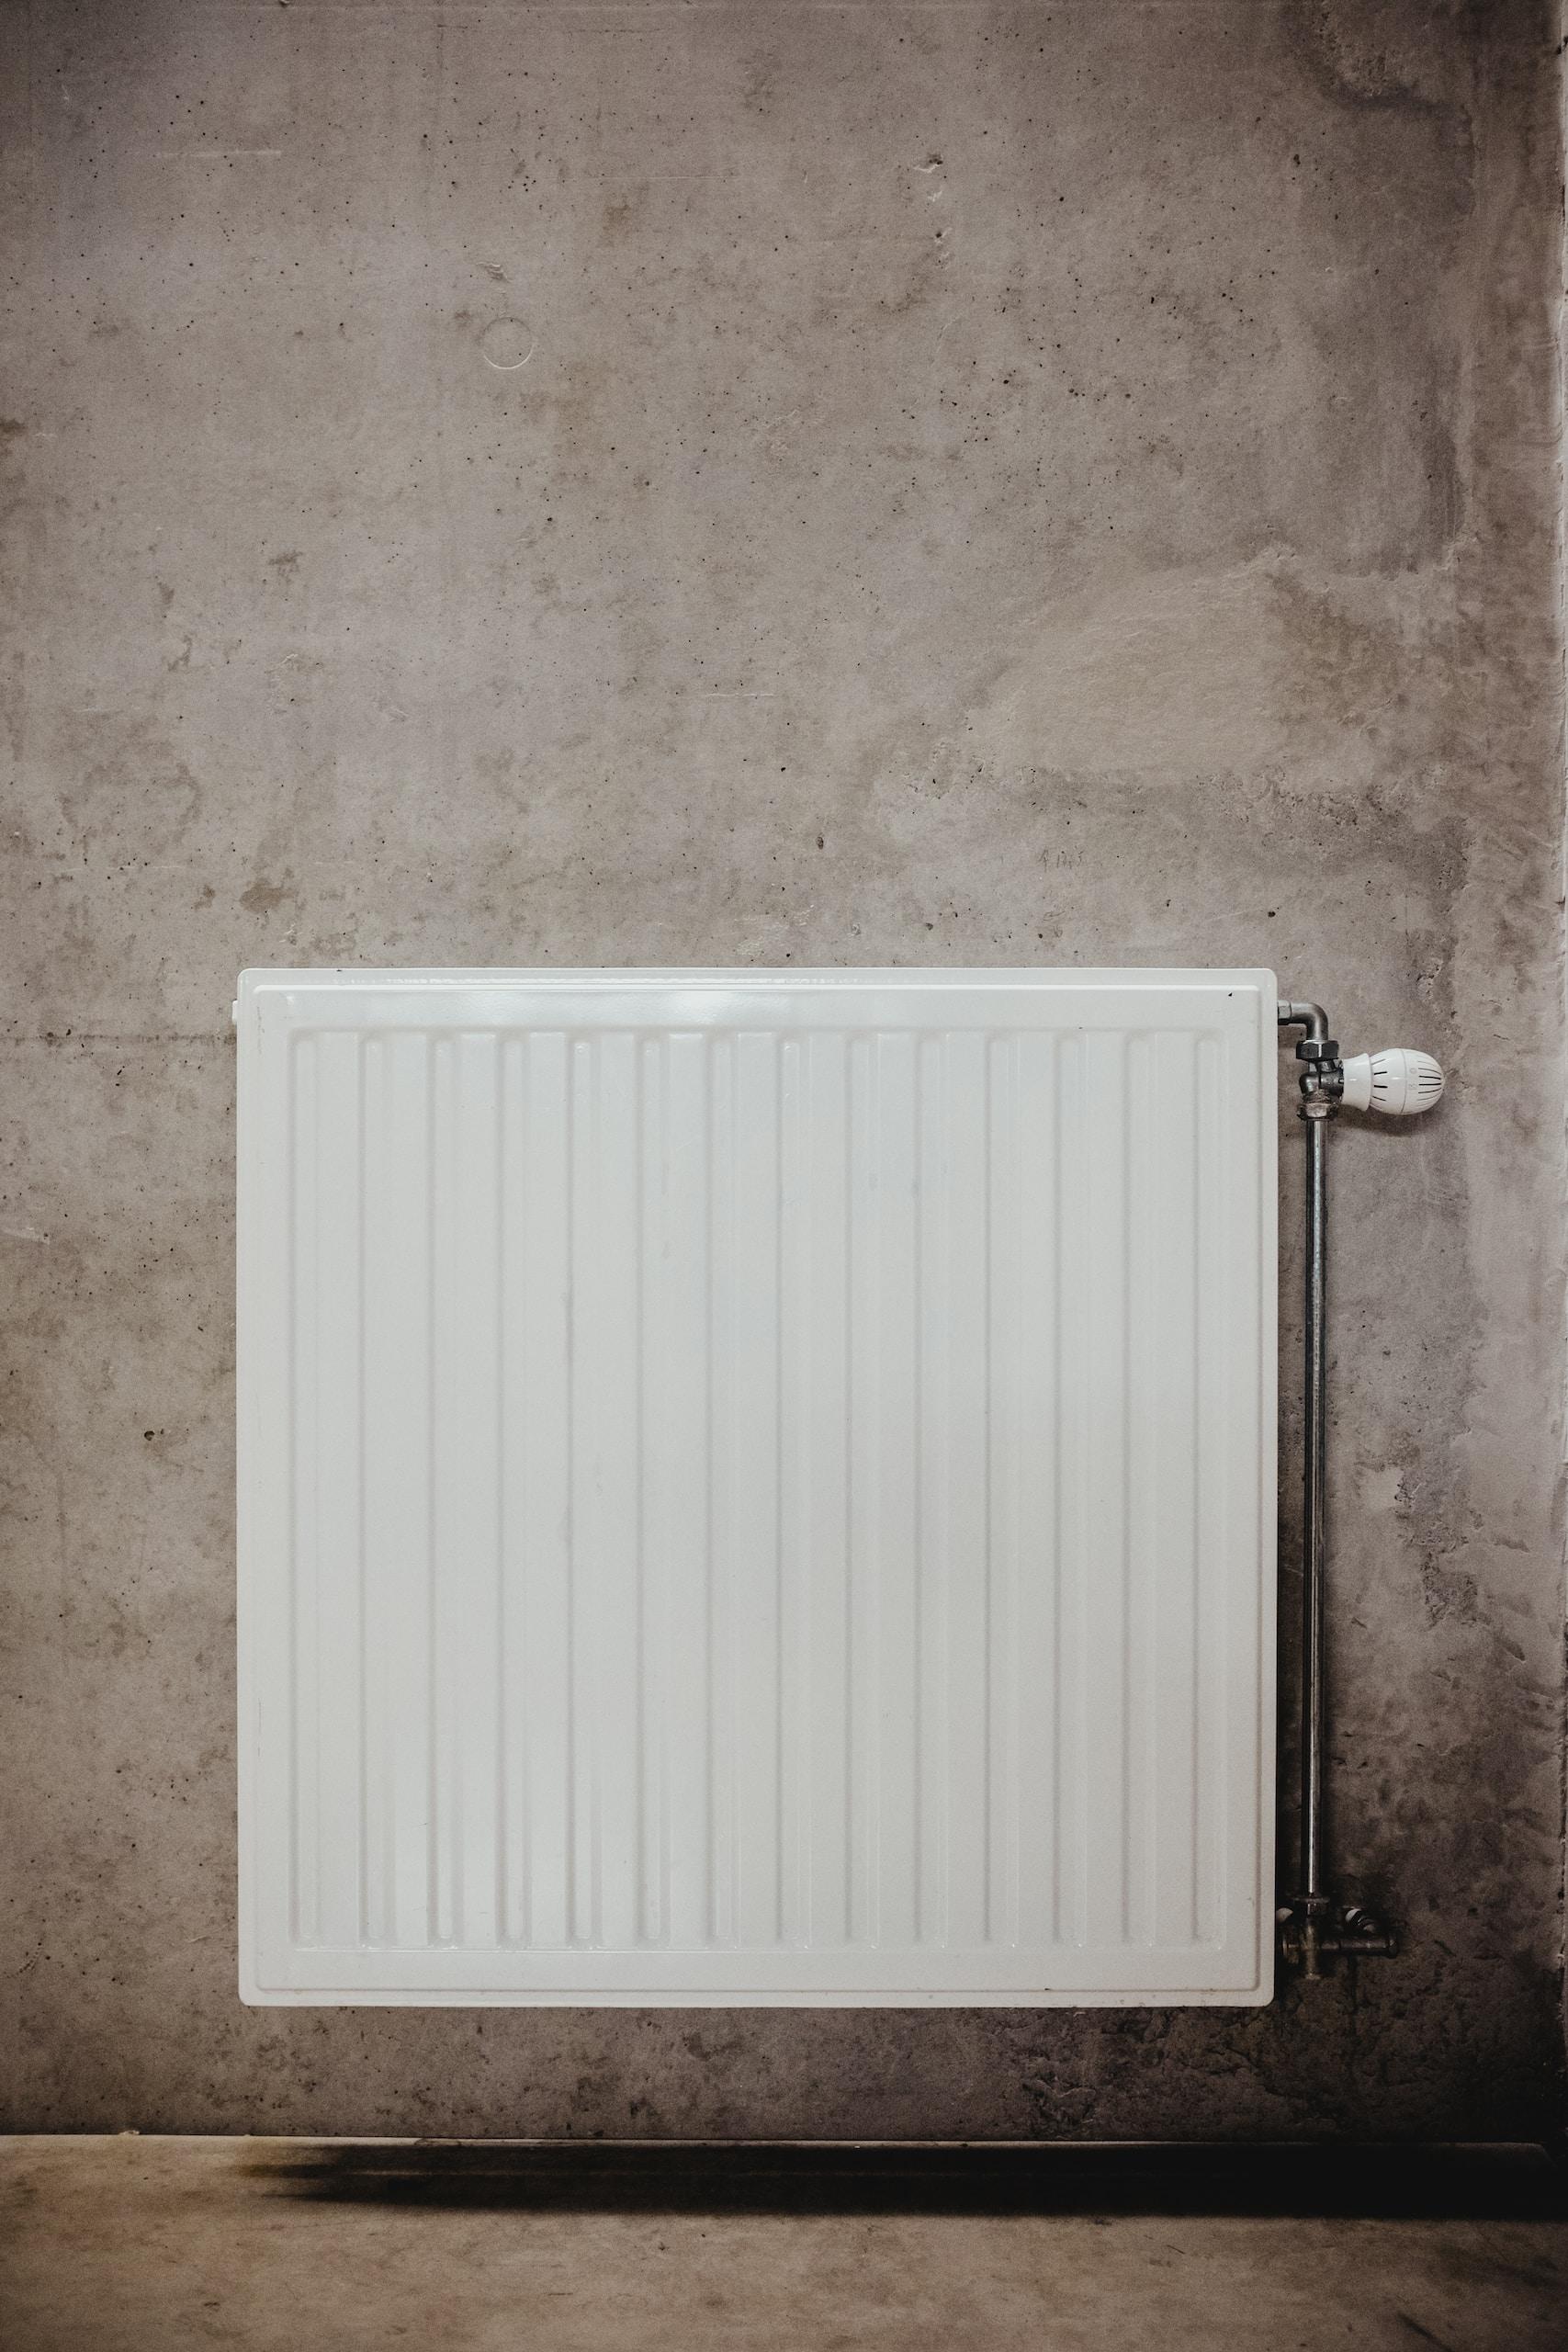 white metal panel heater on gray concrete wall